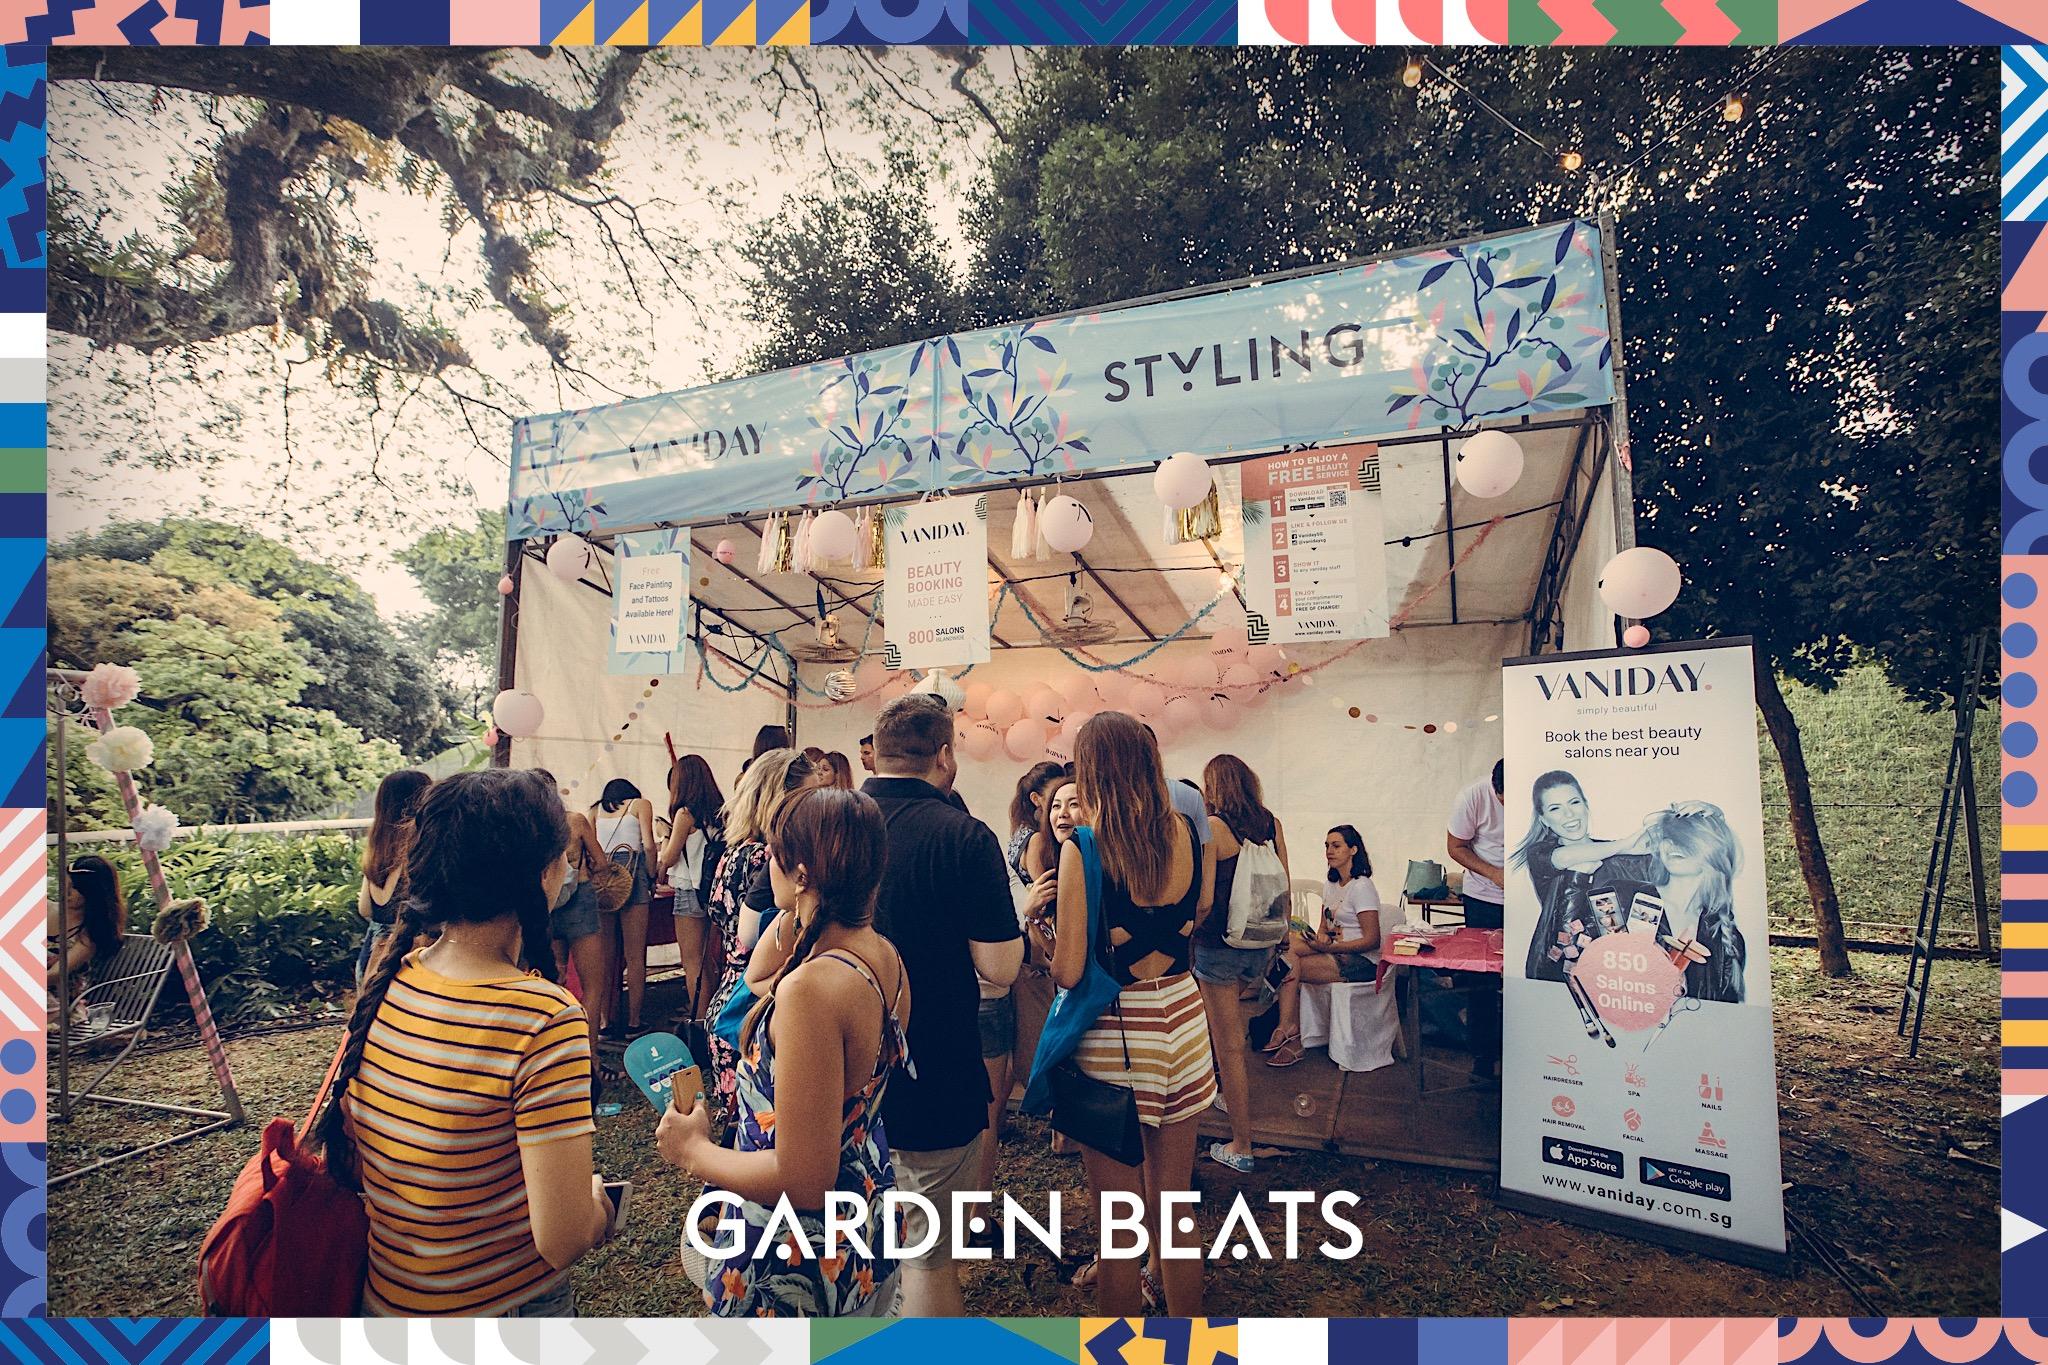 03032018_GardenBeats_Colossal389_Watermarked.jpg